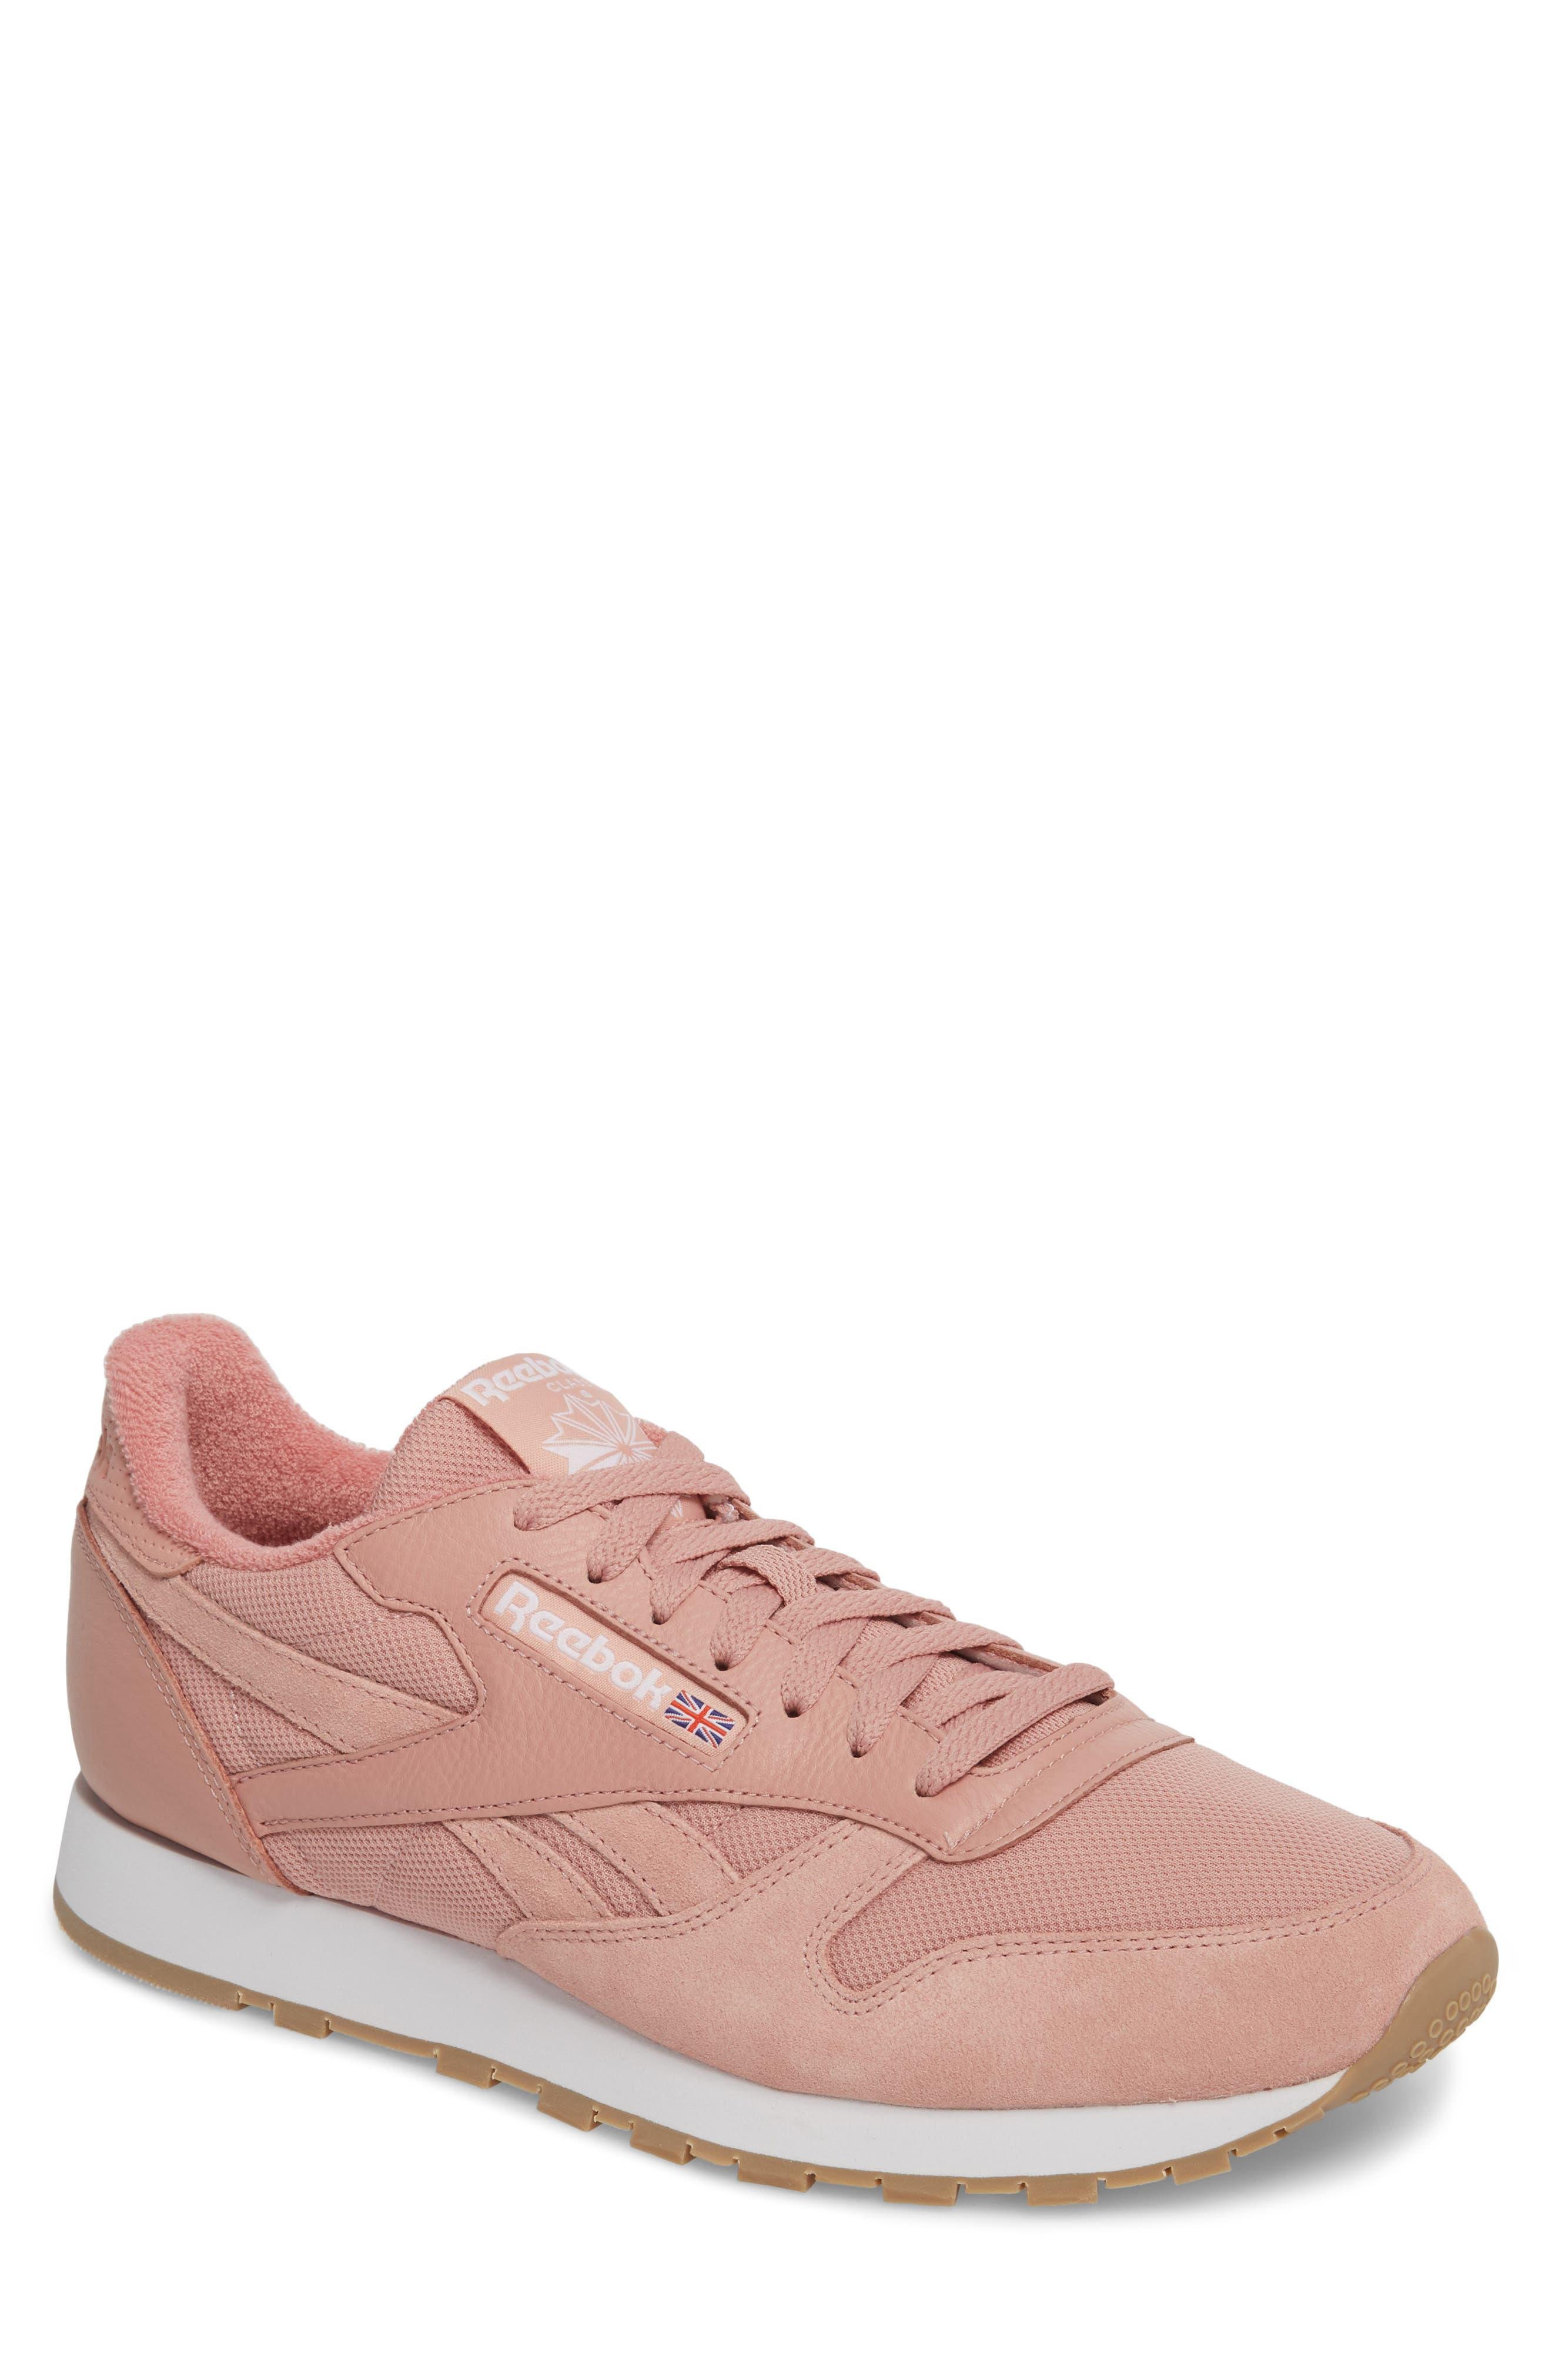 ESTL Classic Leather Sneaker,                         Main,                         color, CHALK PINK/ WHITE